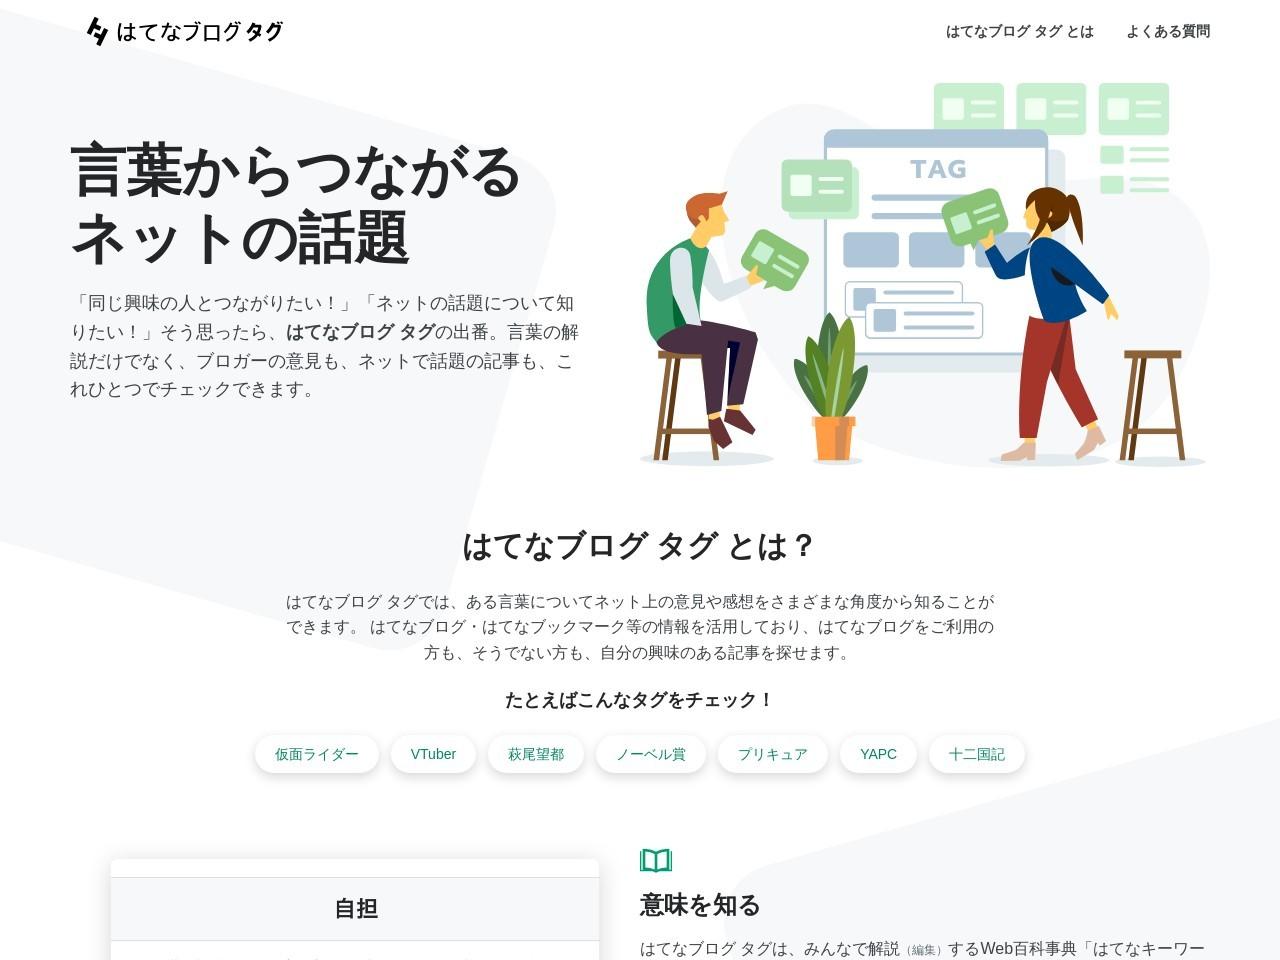 http://d.hatena.ne.jp/kt_hiro/20120930/1348962600